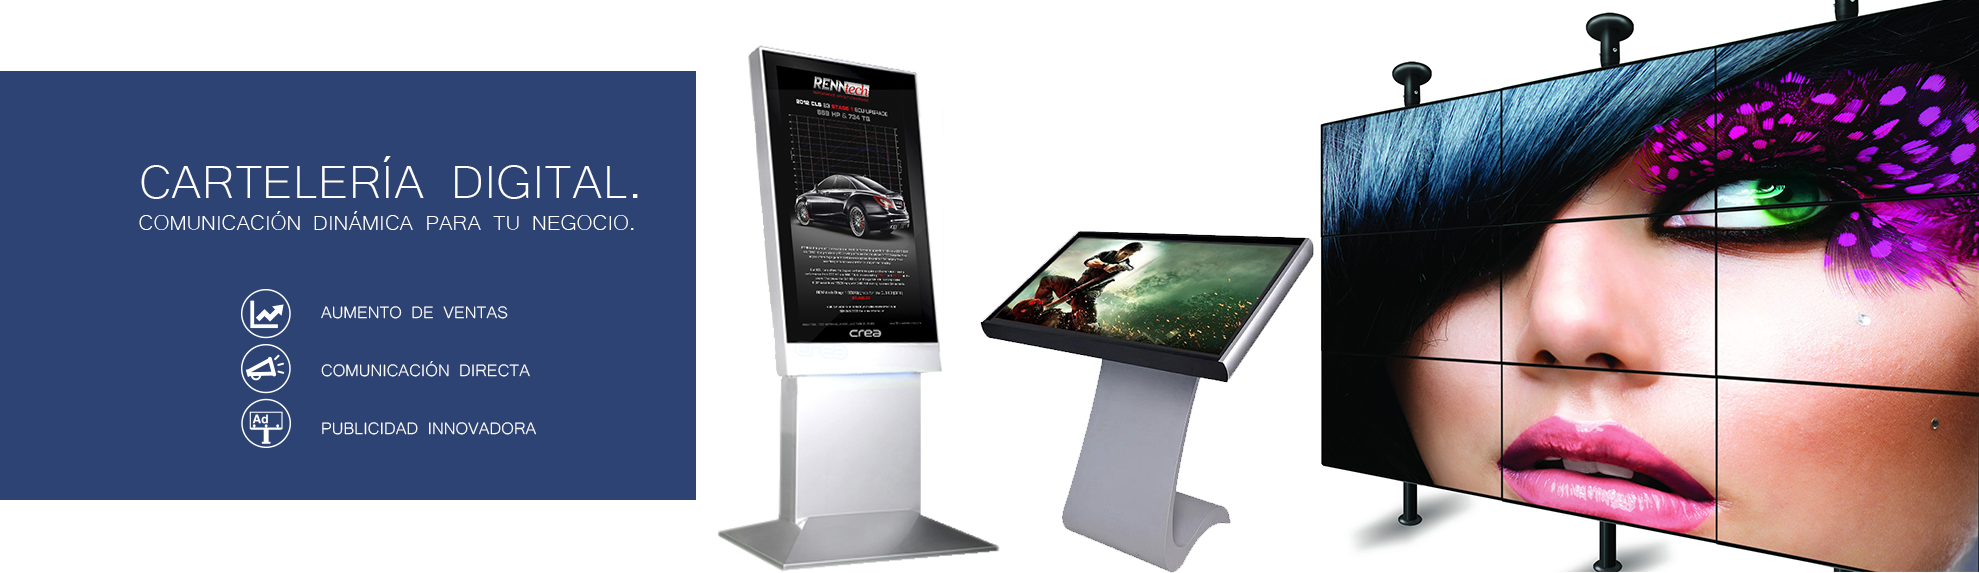 escaparate digital, digital signage, pantallas publicidad, pantallas gigantes, paneles led, videowall